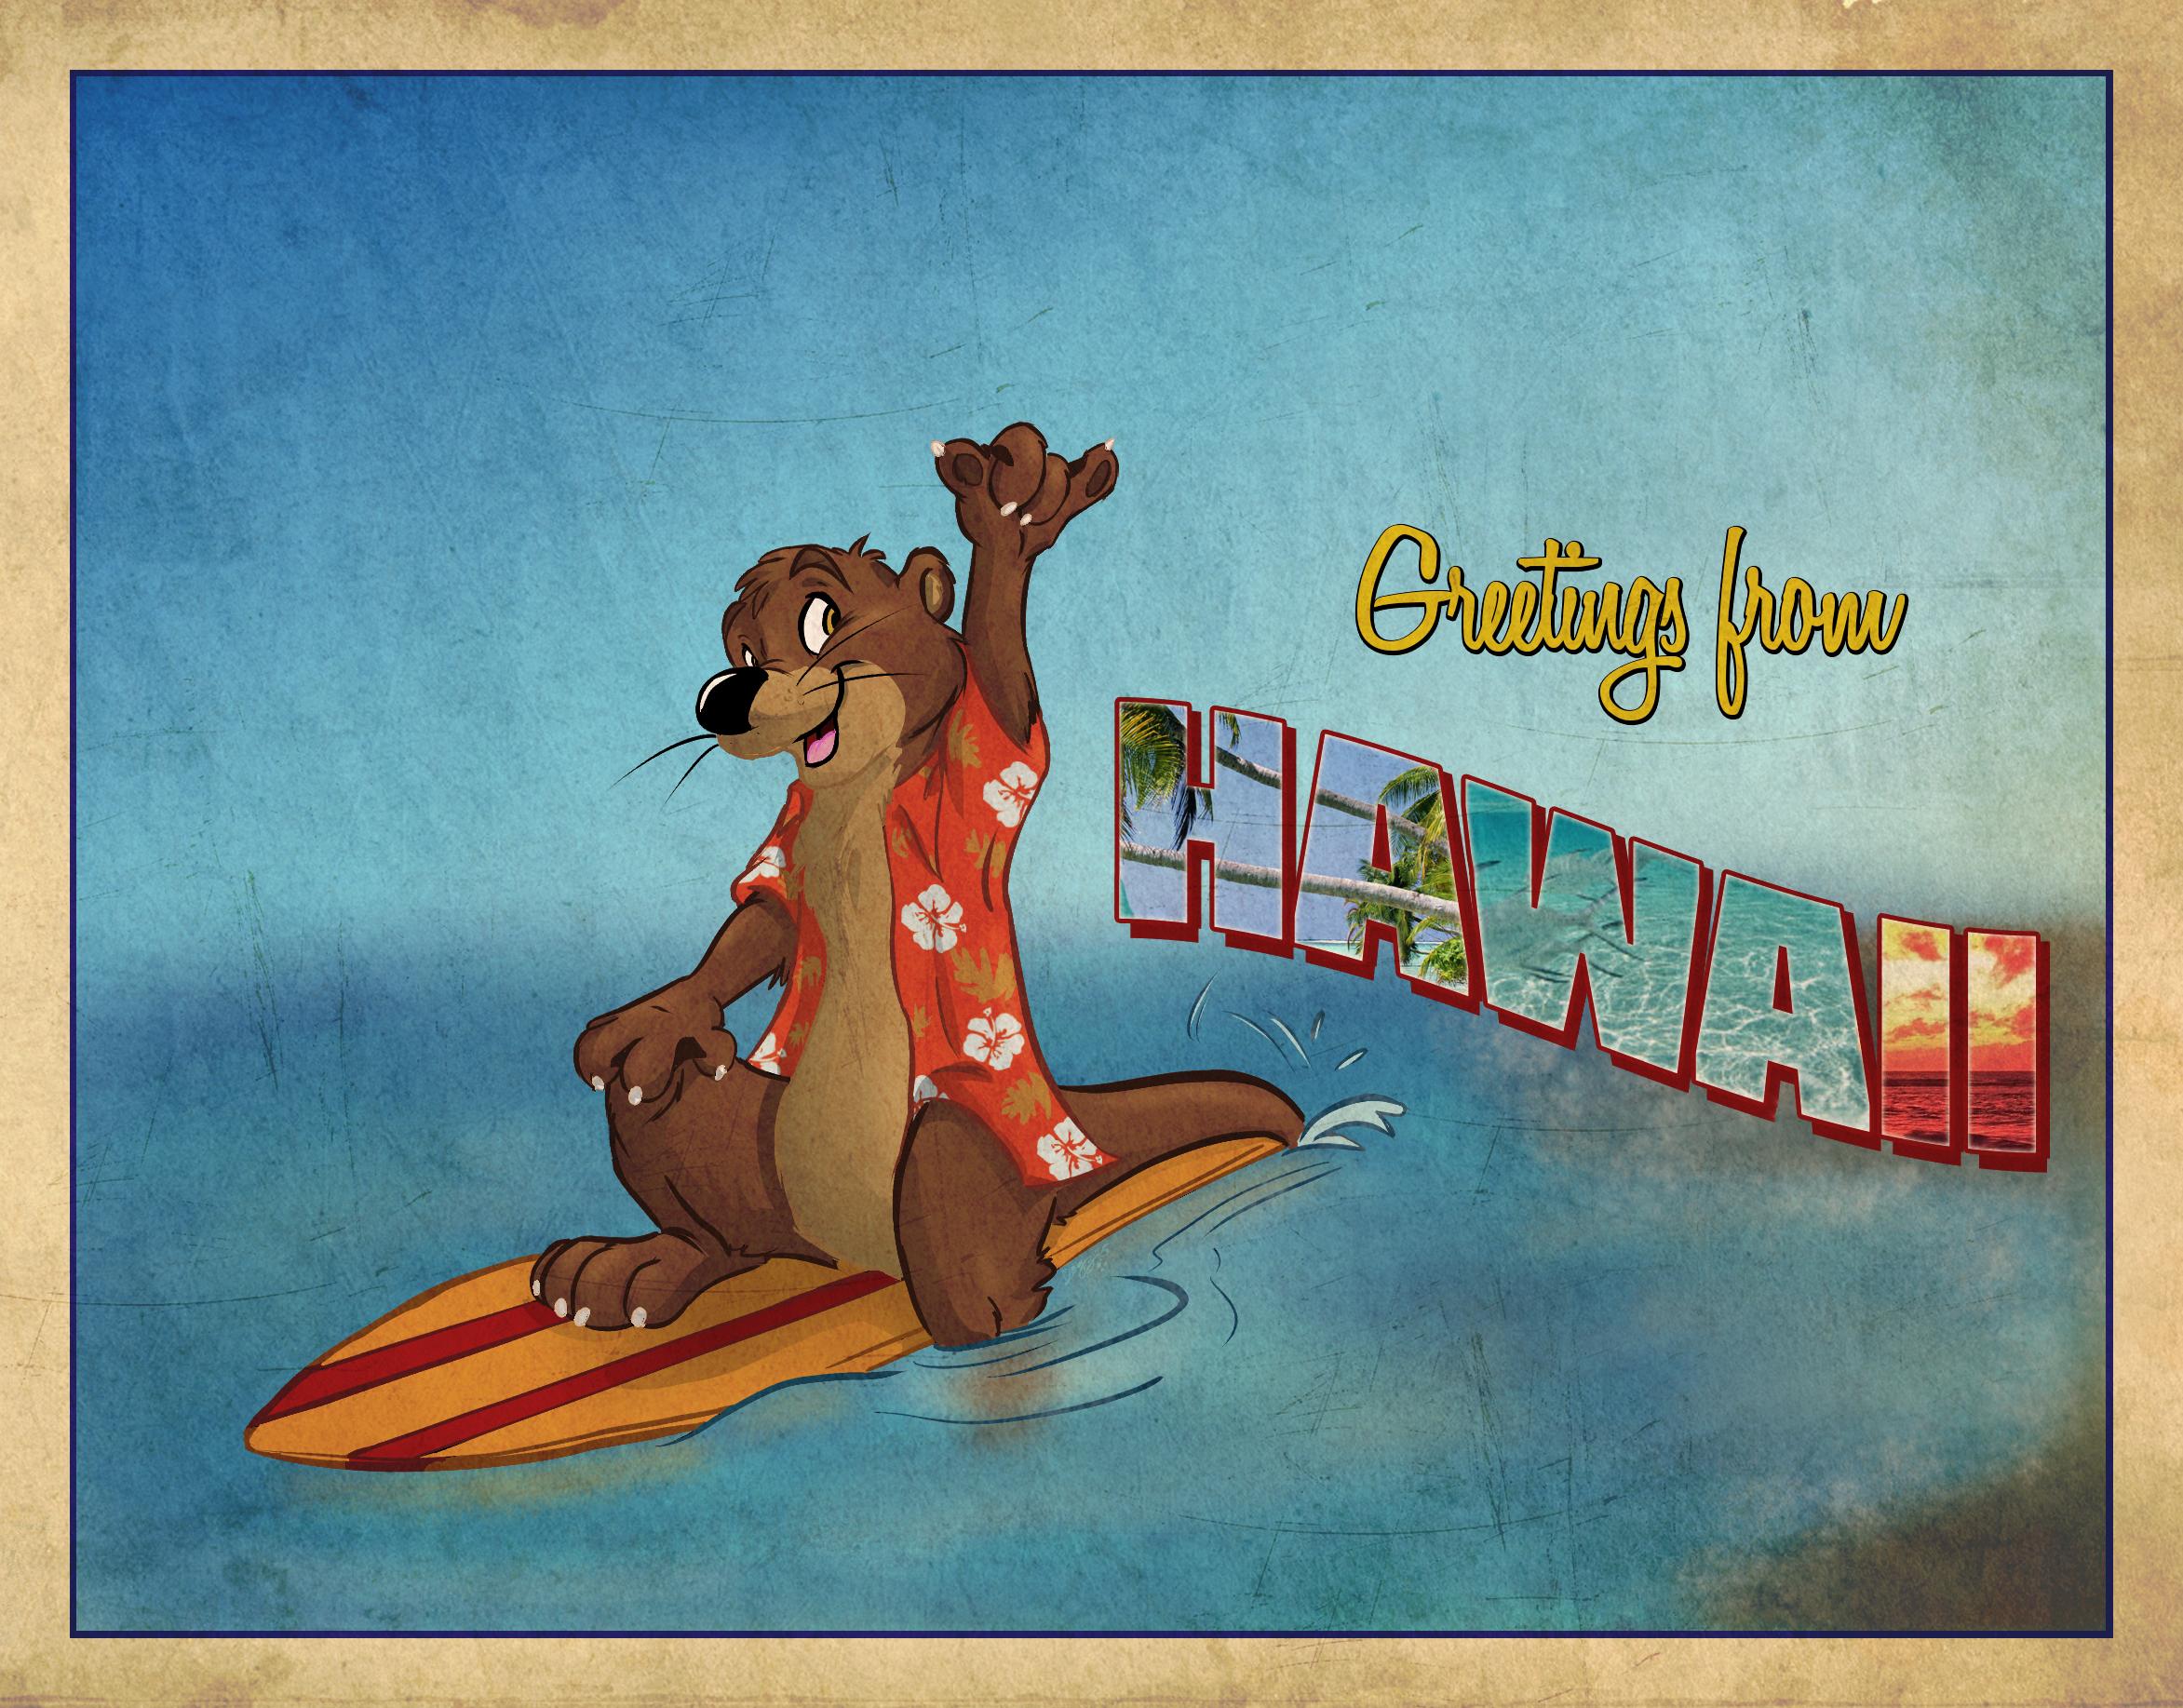 Greetings from hawaii dogzrbarkn weasyl greetings from hawaii dogzrbarkn kristyandbryce Choice Image